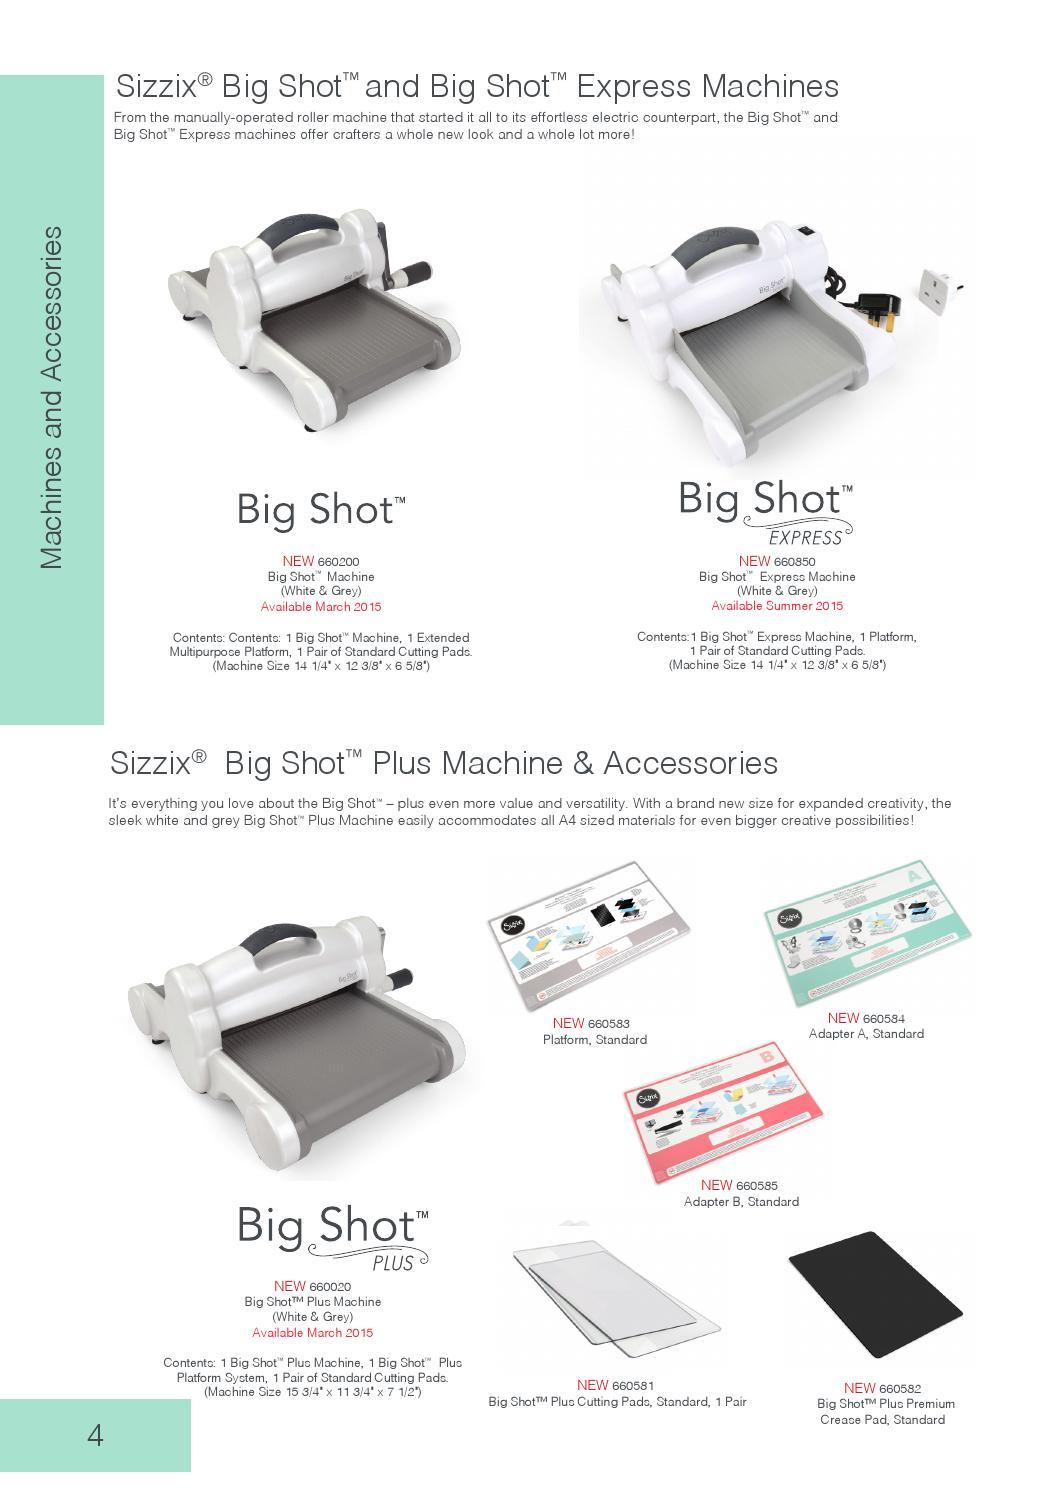 Standard 660582 SIZZIX Big Shot Plus Accessory Premium Crease Pad